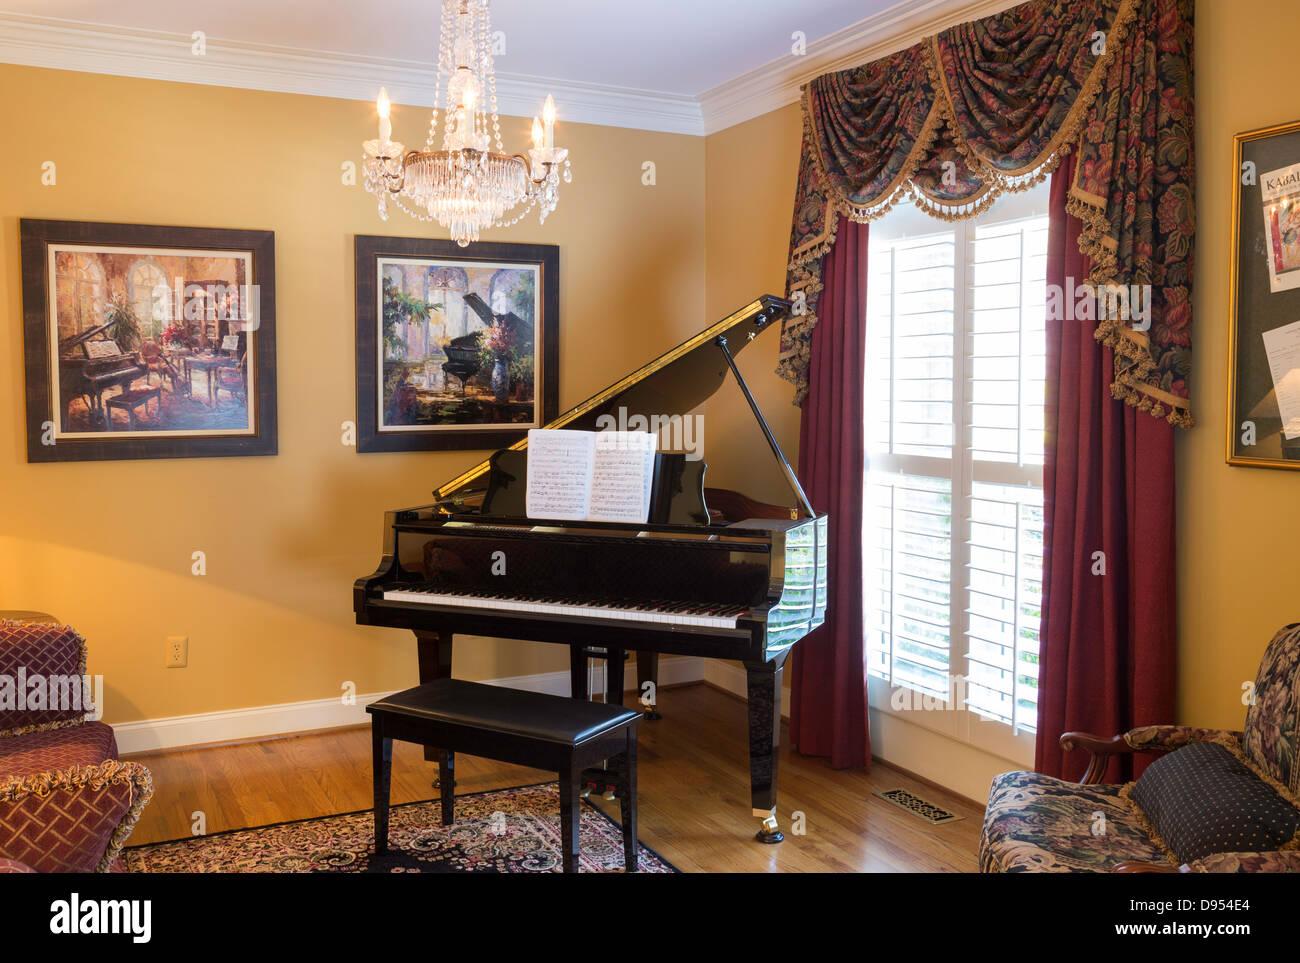 luxury home interior room with grand piano stock photo 57276300 alamy